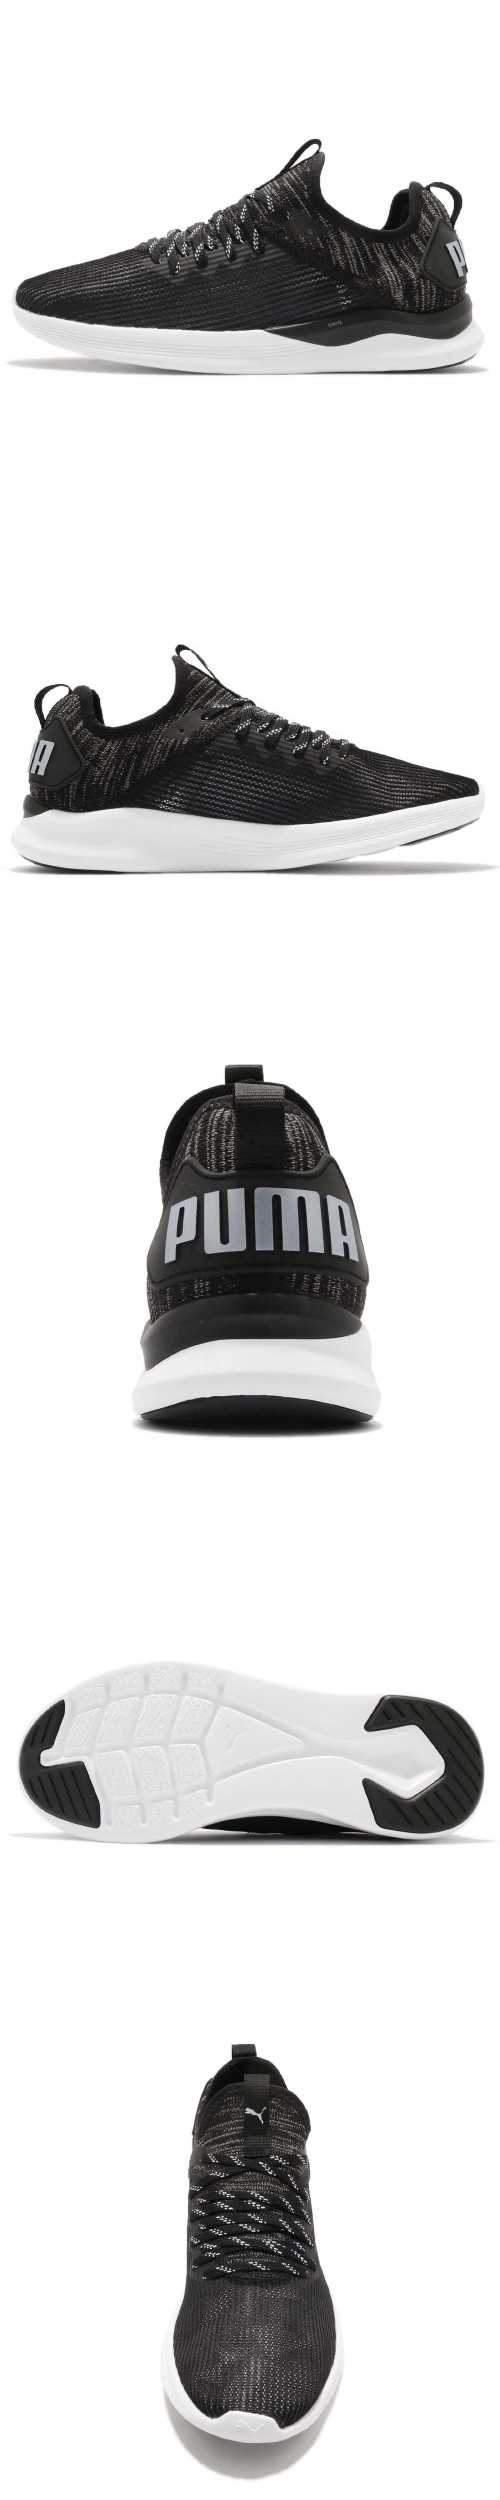 Puma 慢跑鞋 Ignite Flash 女鞋